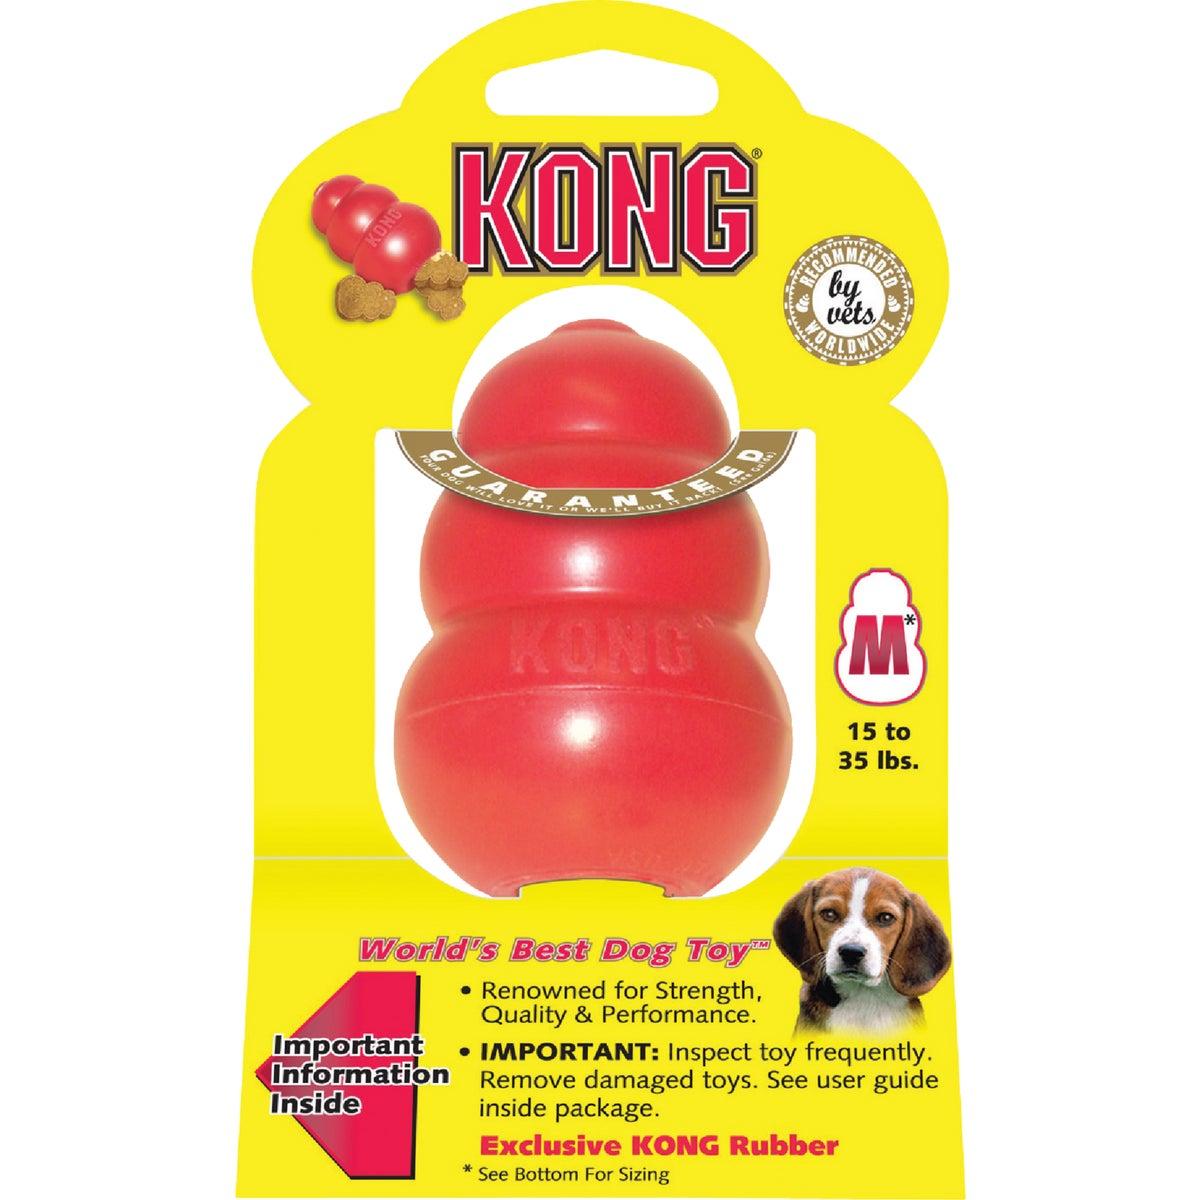 KONG Classic KONG Dog Toy, Medium, Red